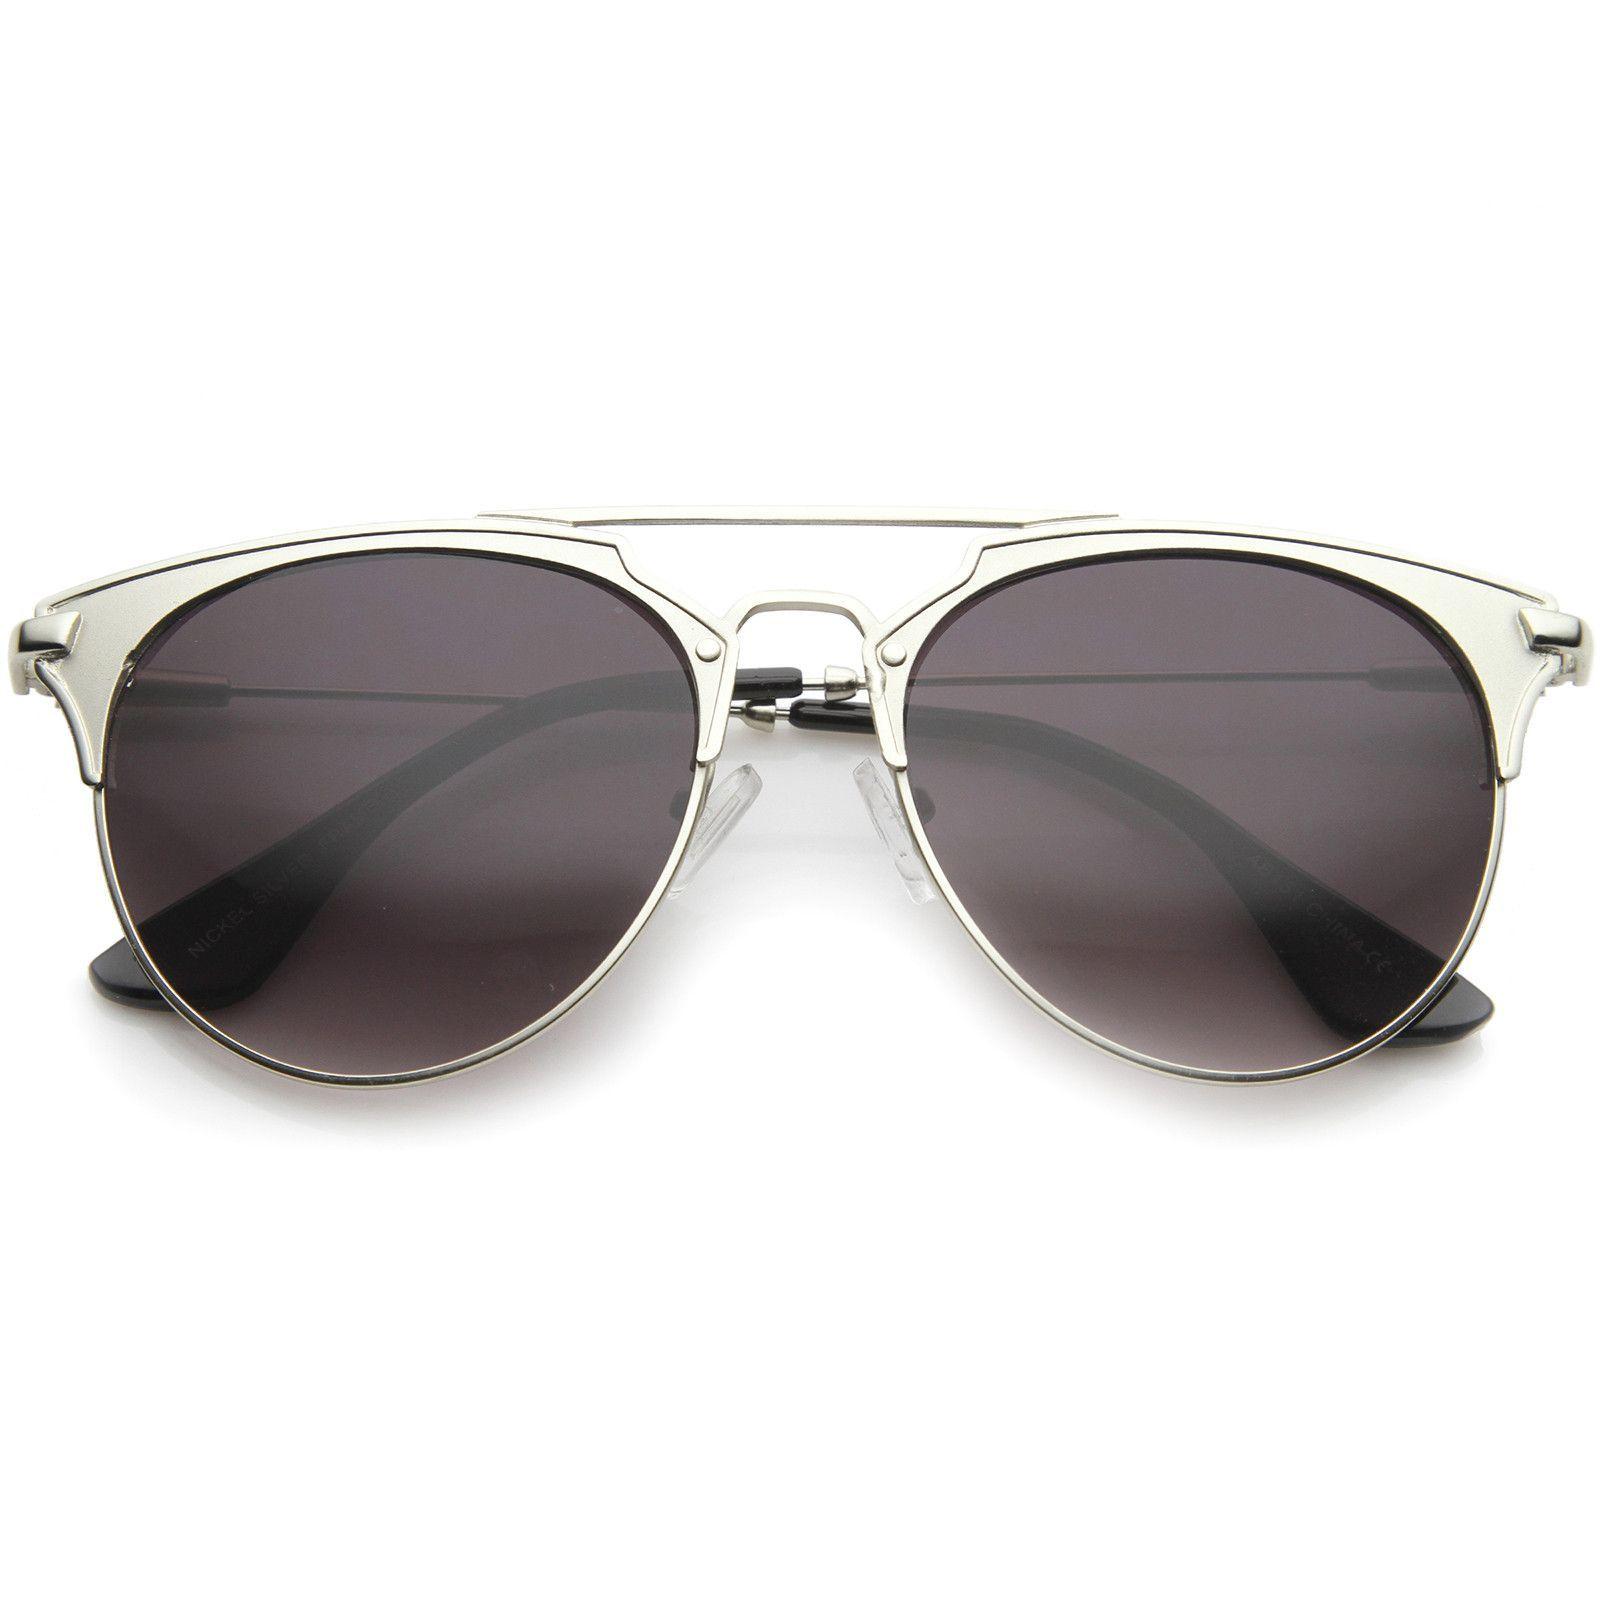 Modern Fashion Full Metallic Double Bridge Pantos Shape Aviator Sunglasses 56mm